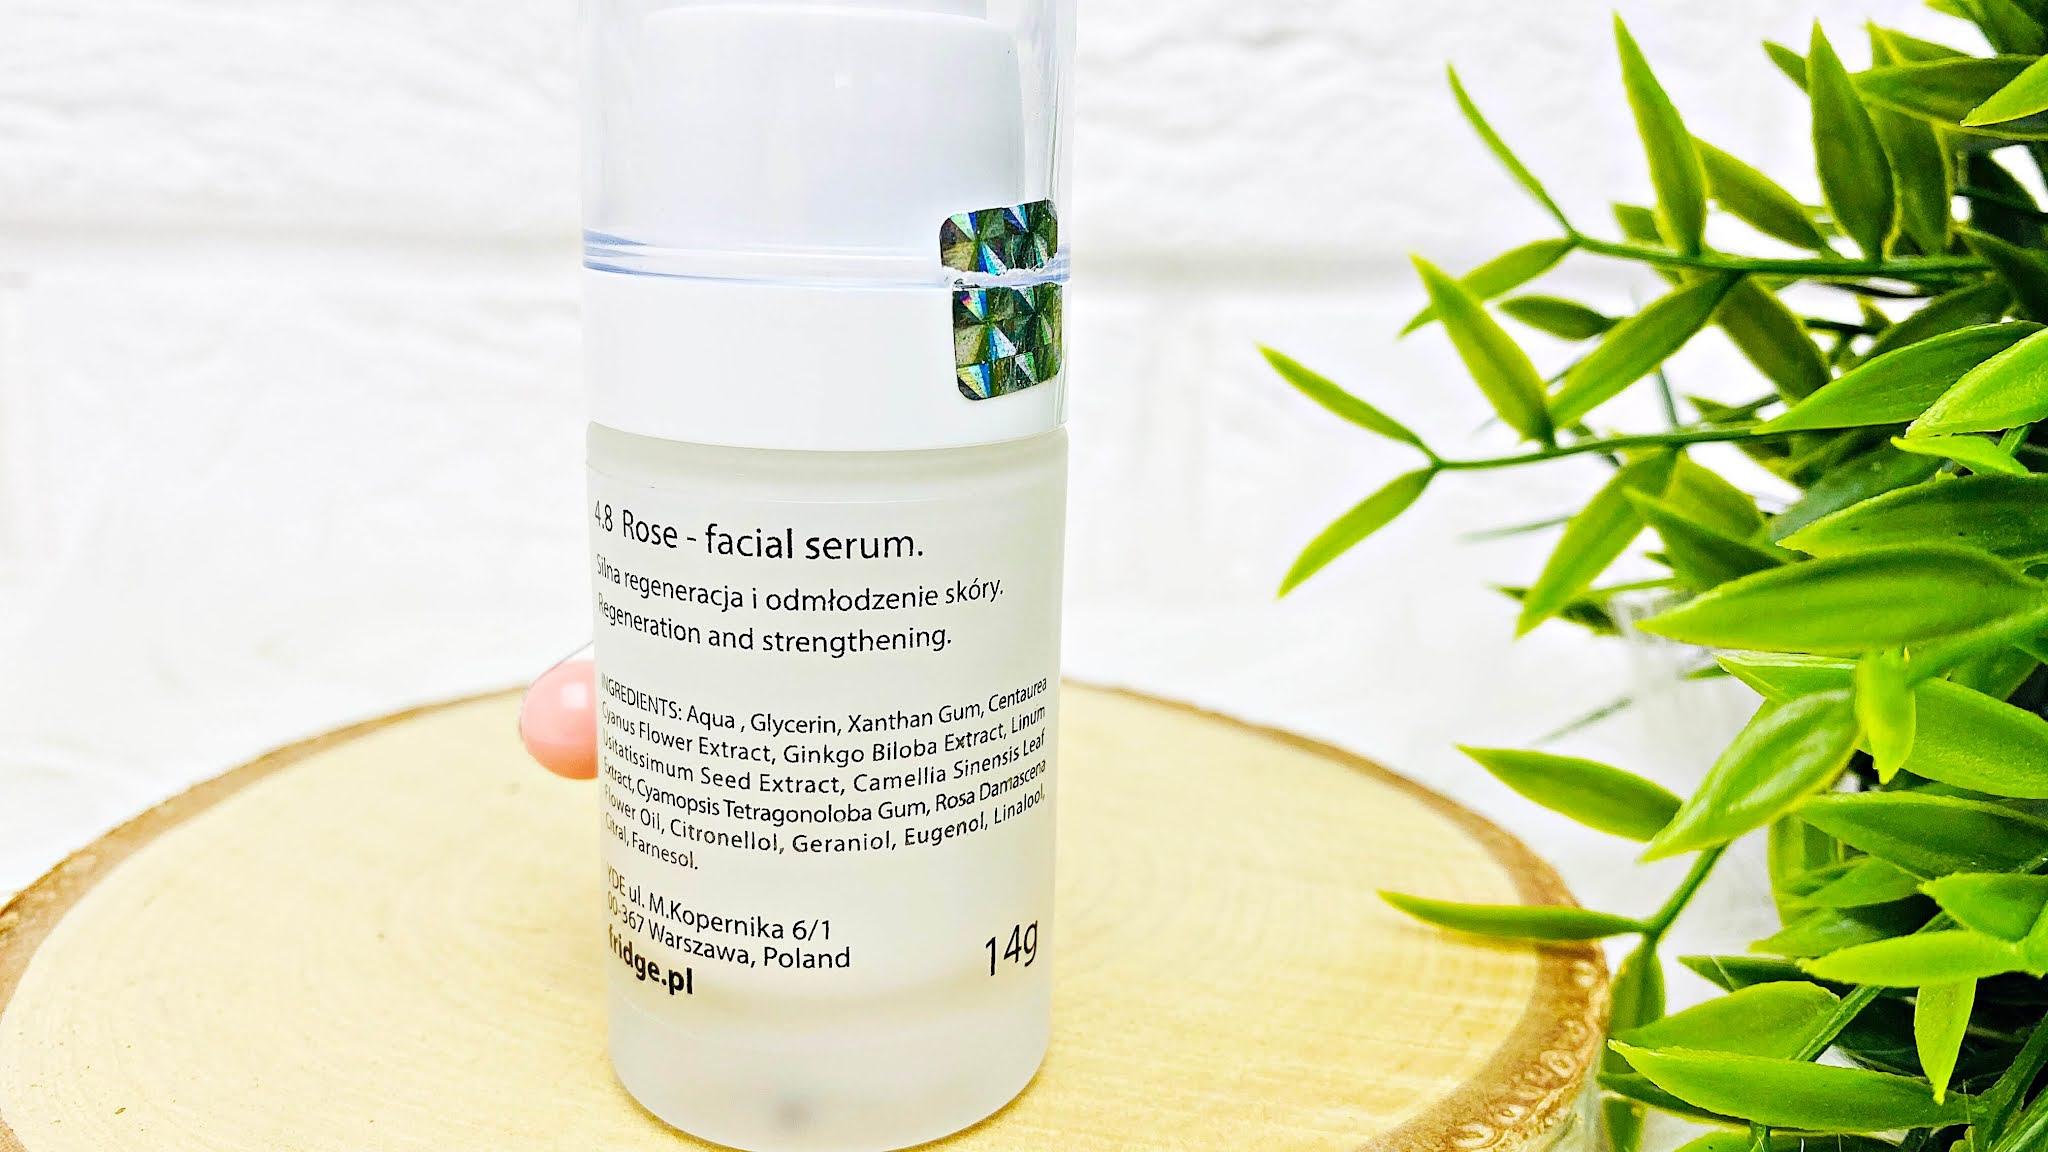 Serum Fridge 4.8 Rose Facial Serum